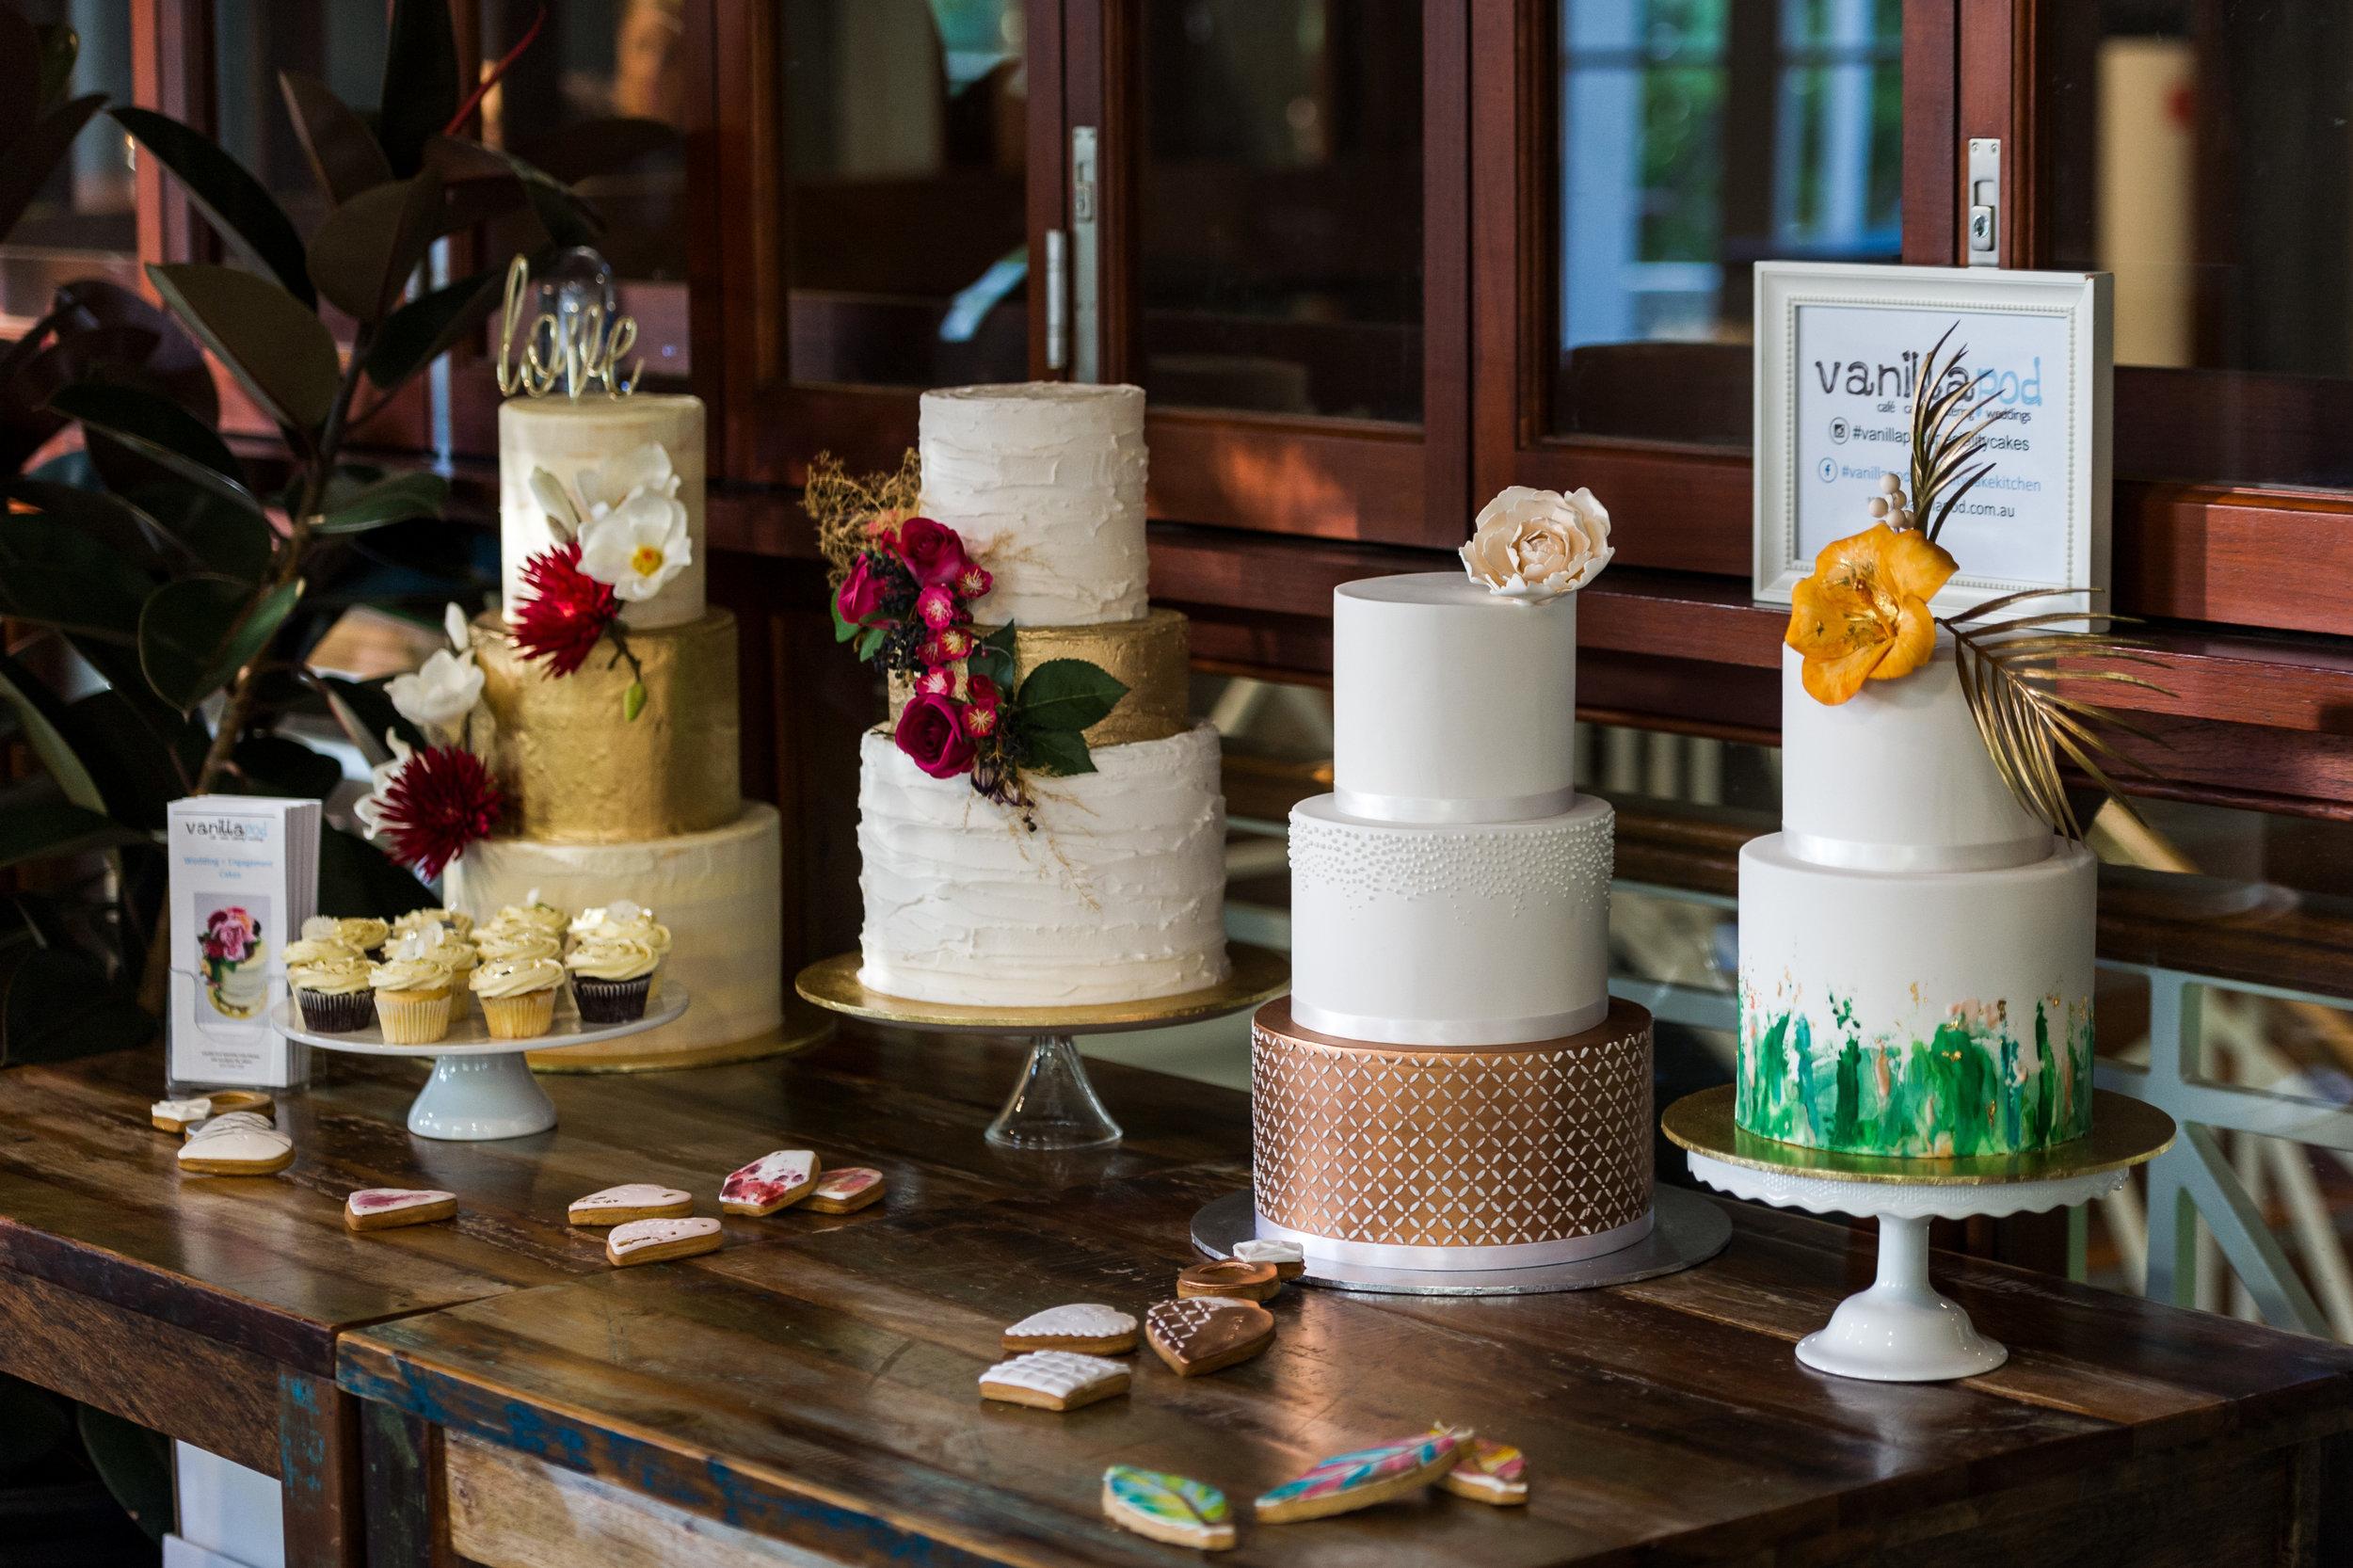 Vanillapod-weddingcake-3-PhotographerAdamFinch.jpg